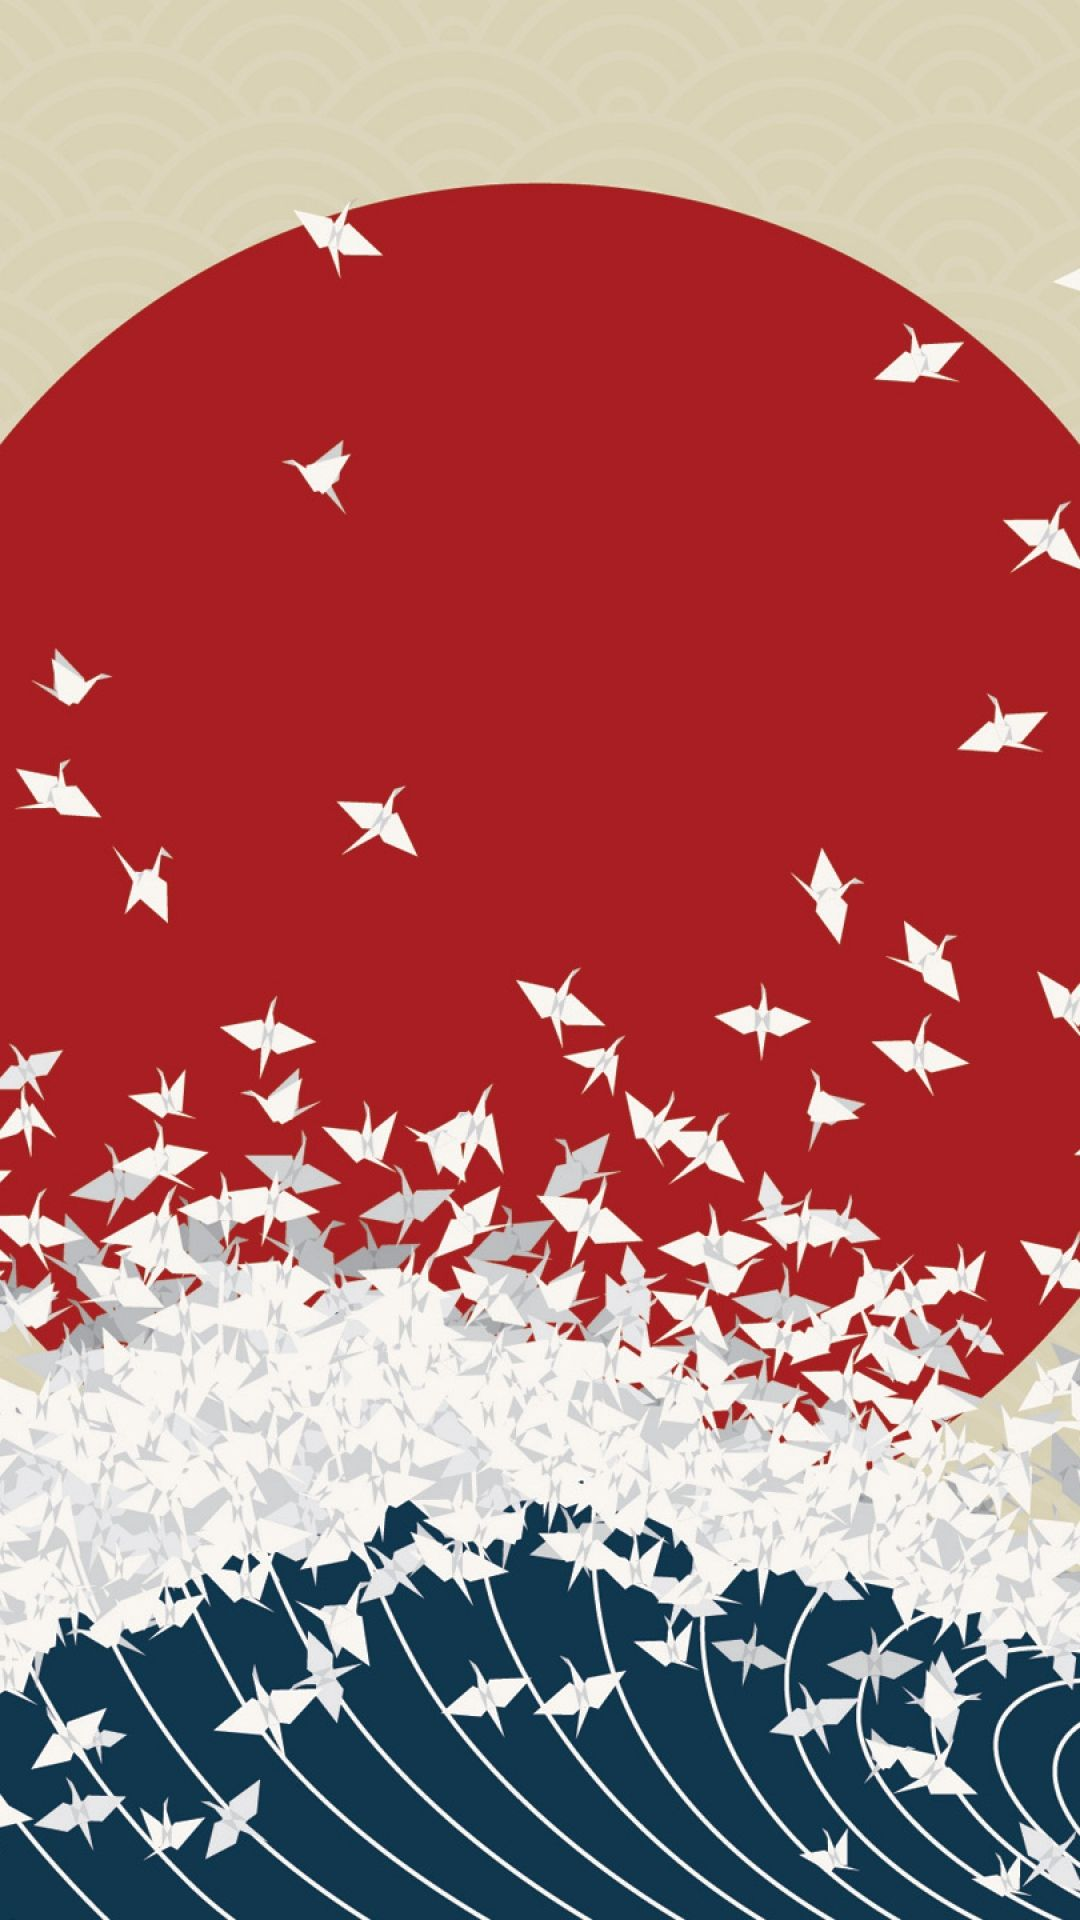 Download Wallpaper 1080x1920 minimalism, origami, japan